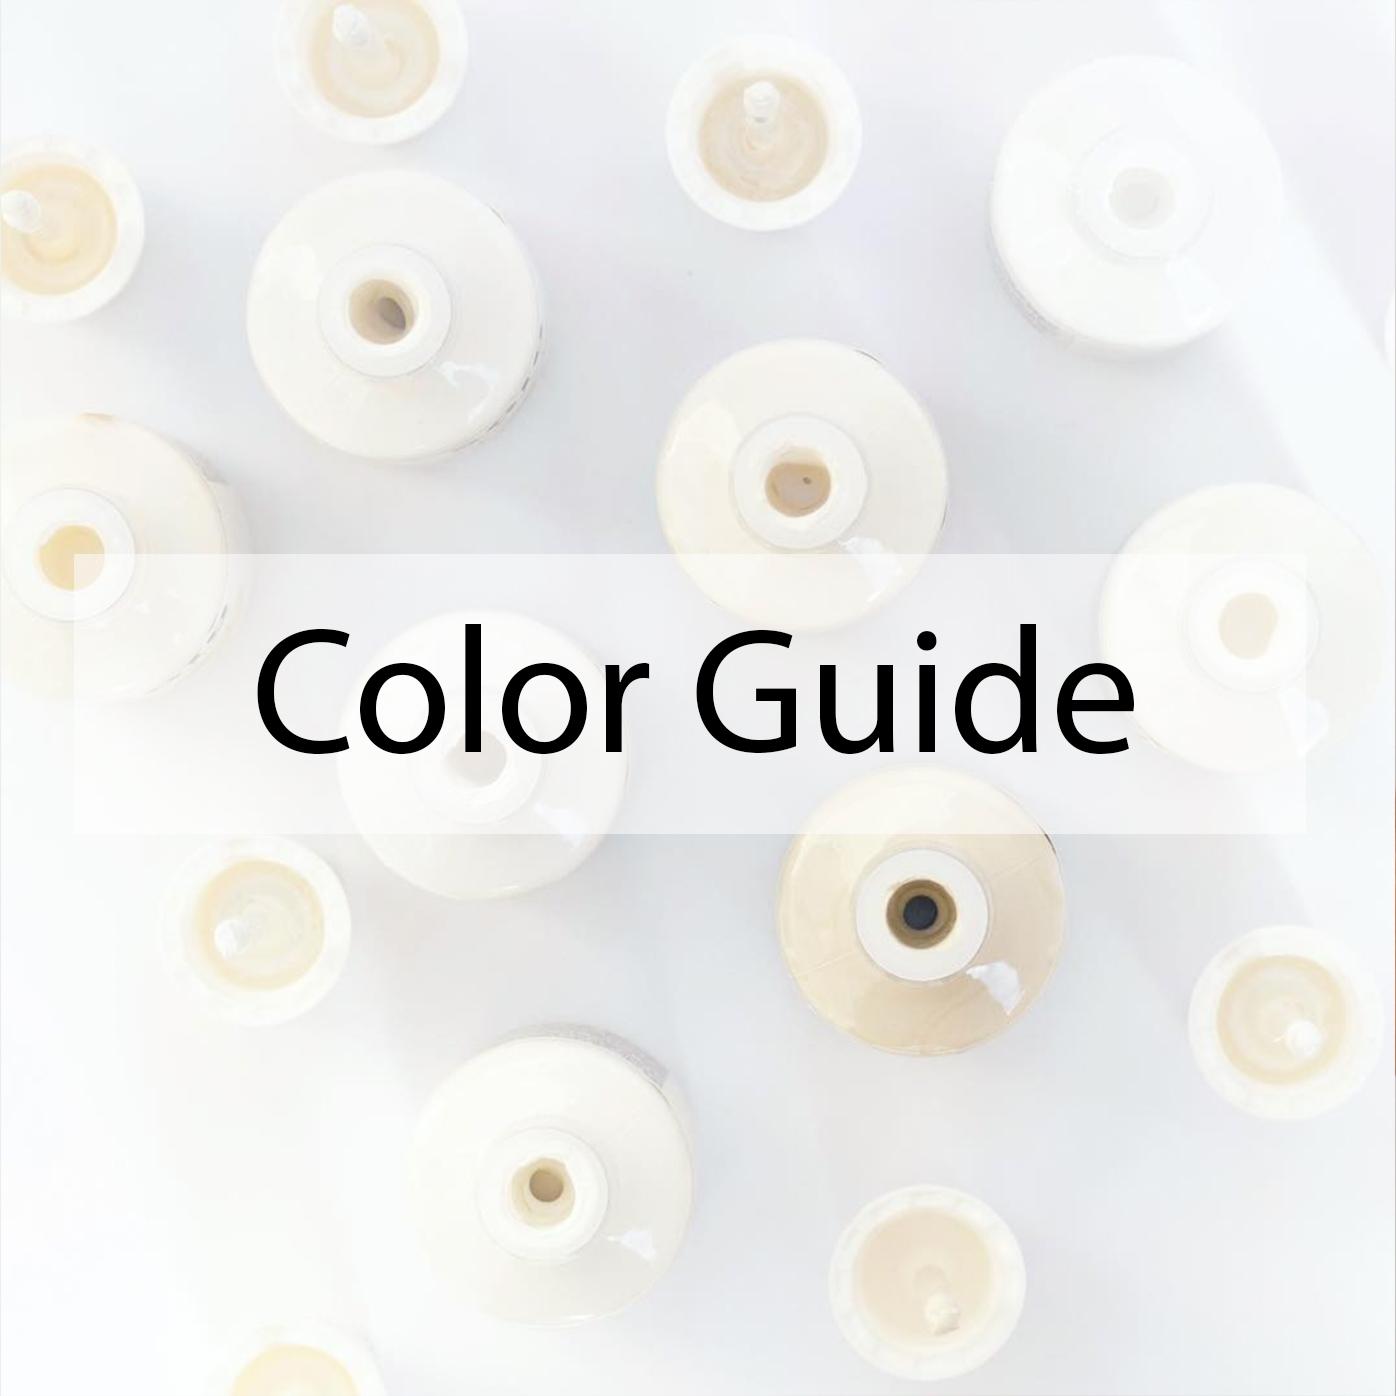 soto_color_guide_banner-square.jpg